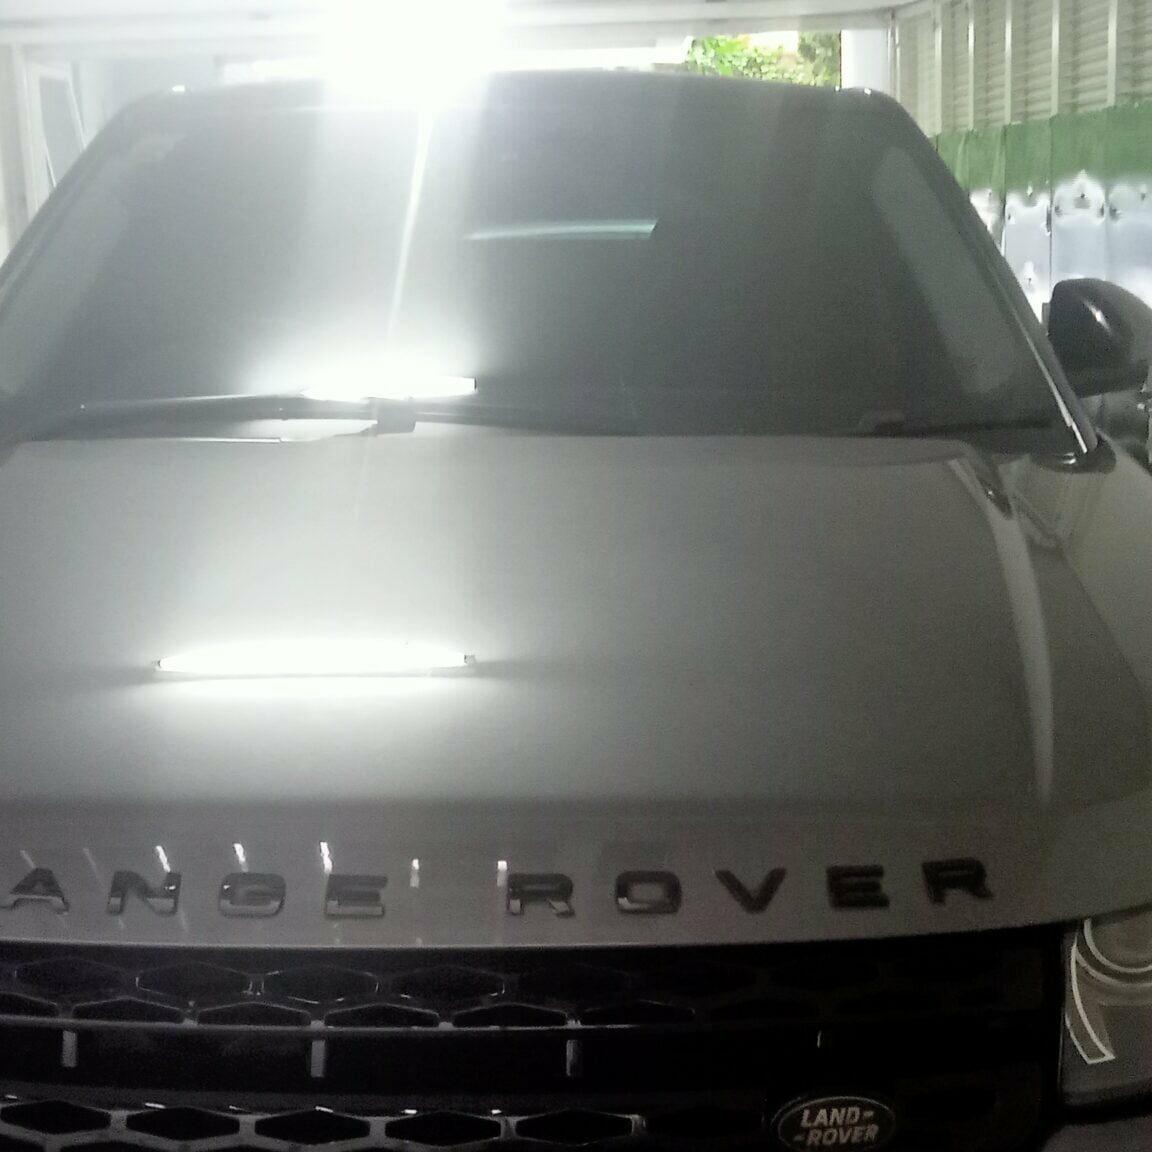 Service Range Rover Evoque Bunyi Saat Rem